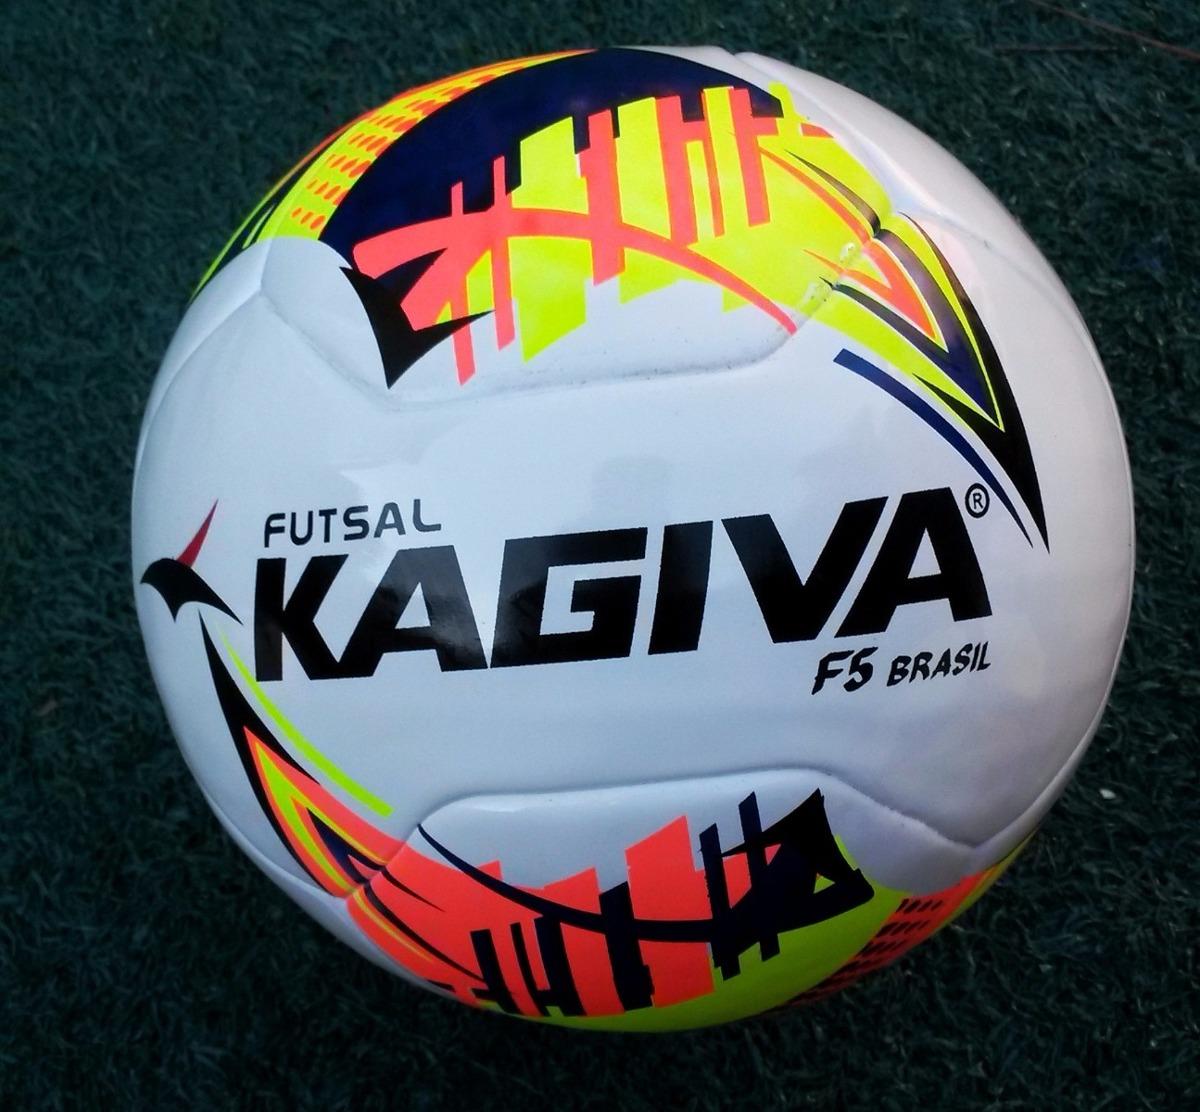 72acde26be4b3 bola futsal kagiva f5 brasil pro da liga futsal oficial 2017. Carregando  zoom.